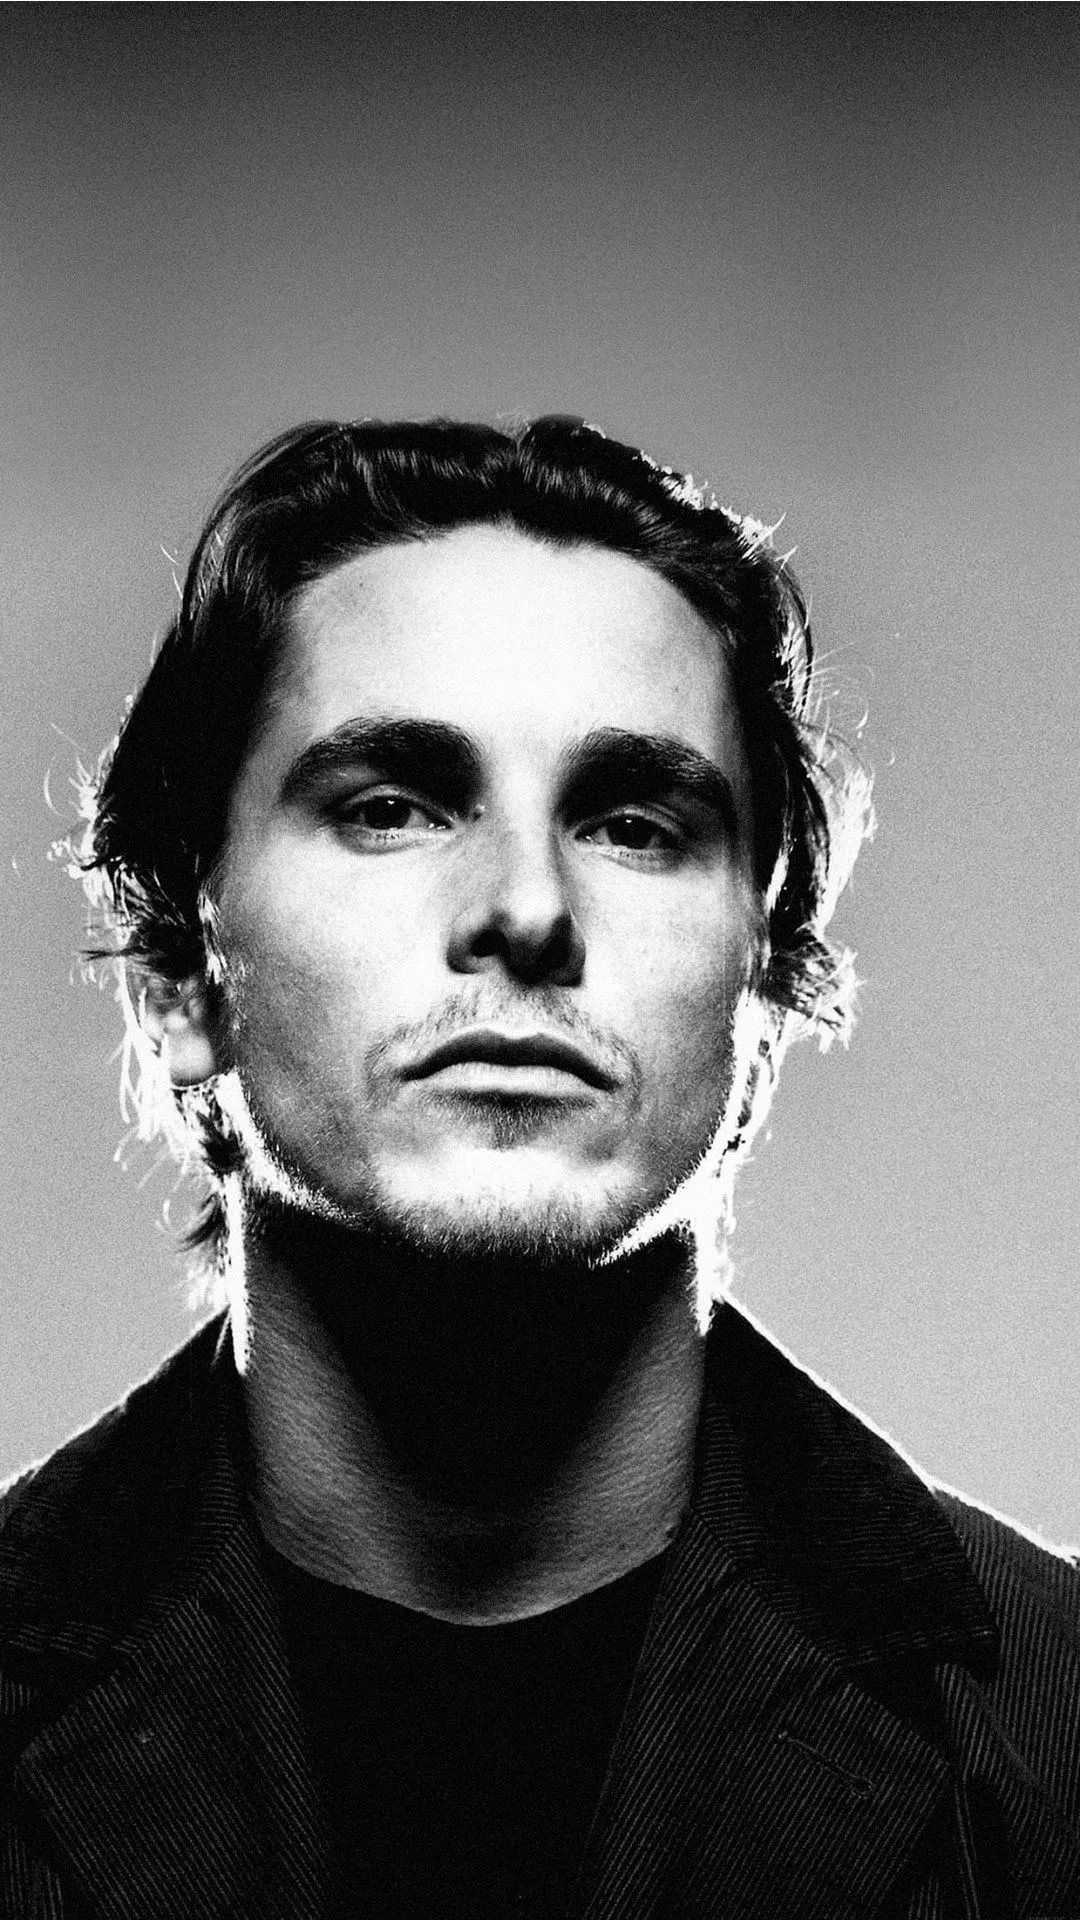 Christian Bale iPhone 6 wallpaper